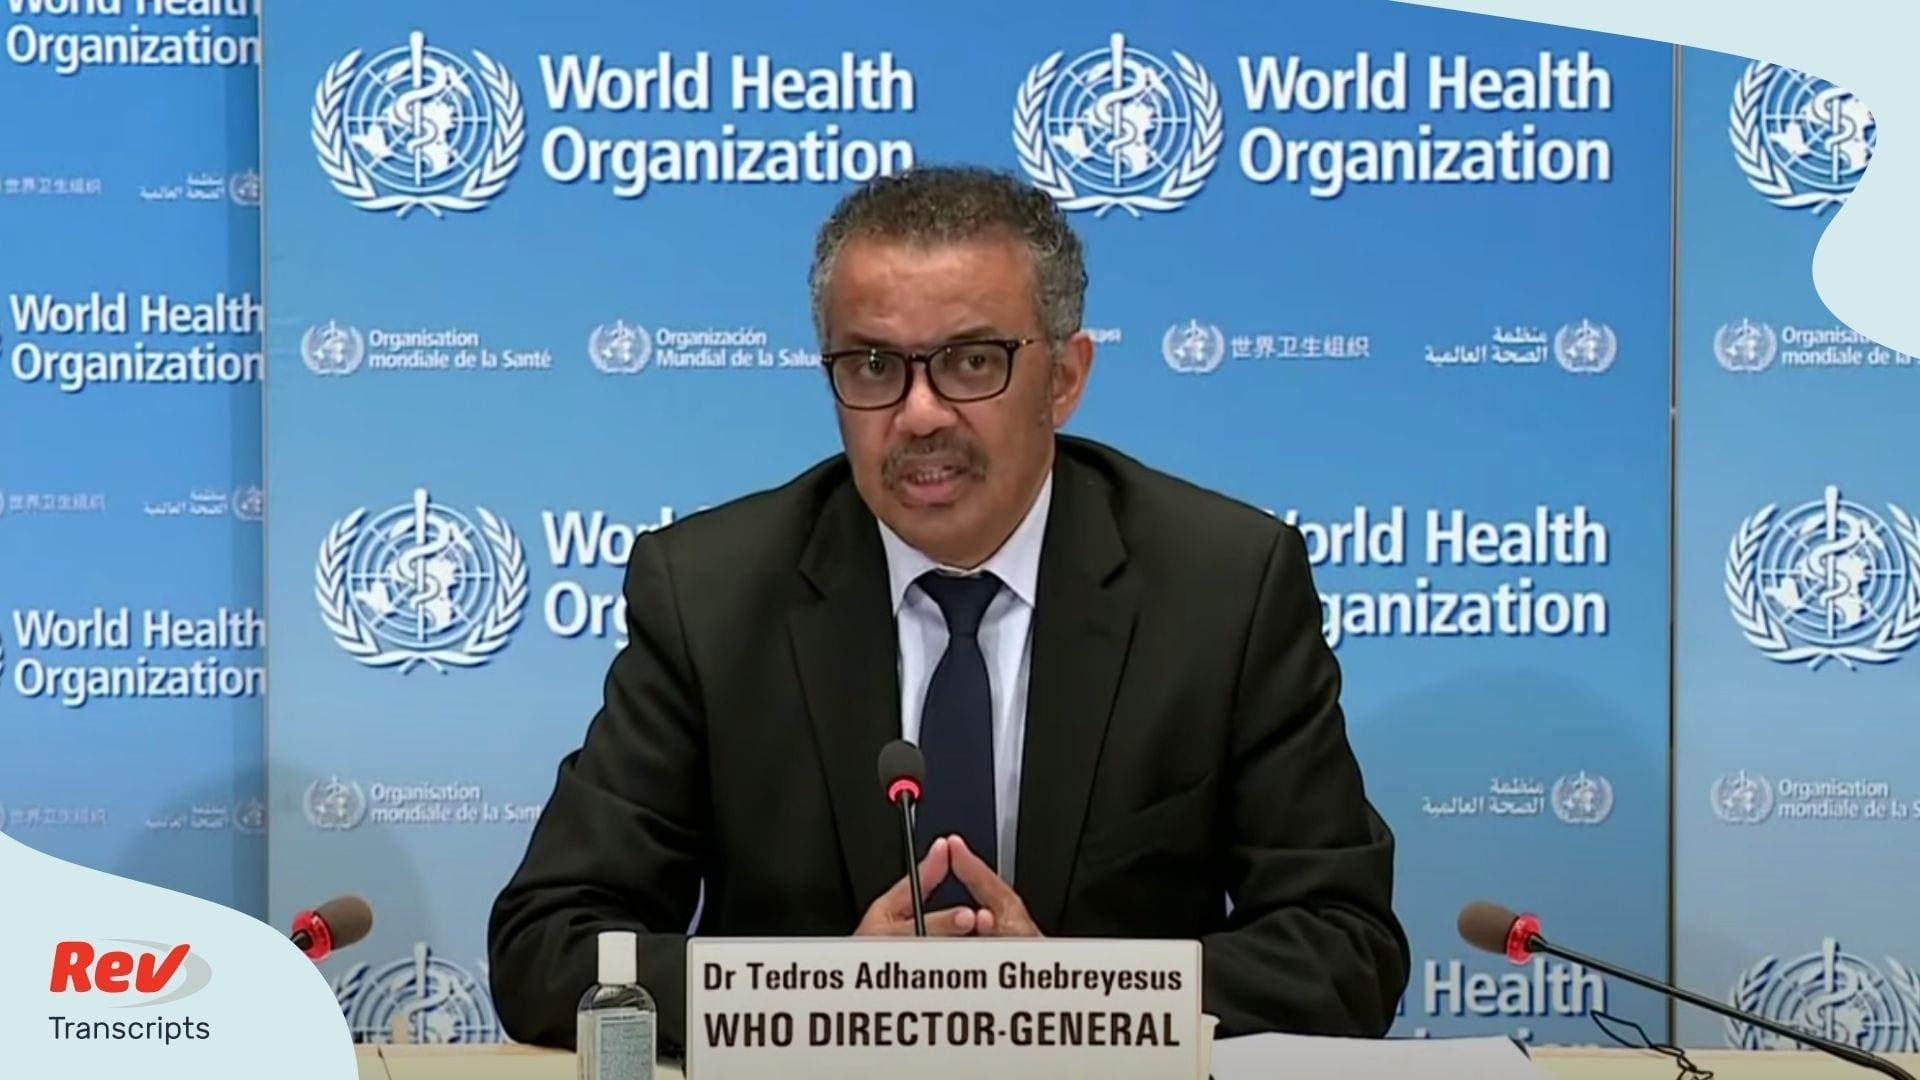 World Health Organization Press Conference Transcript May 27